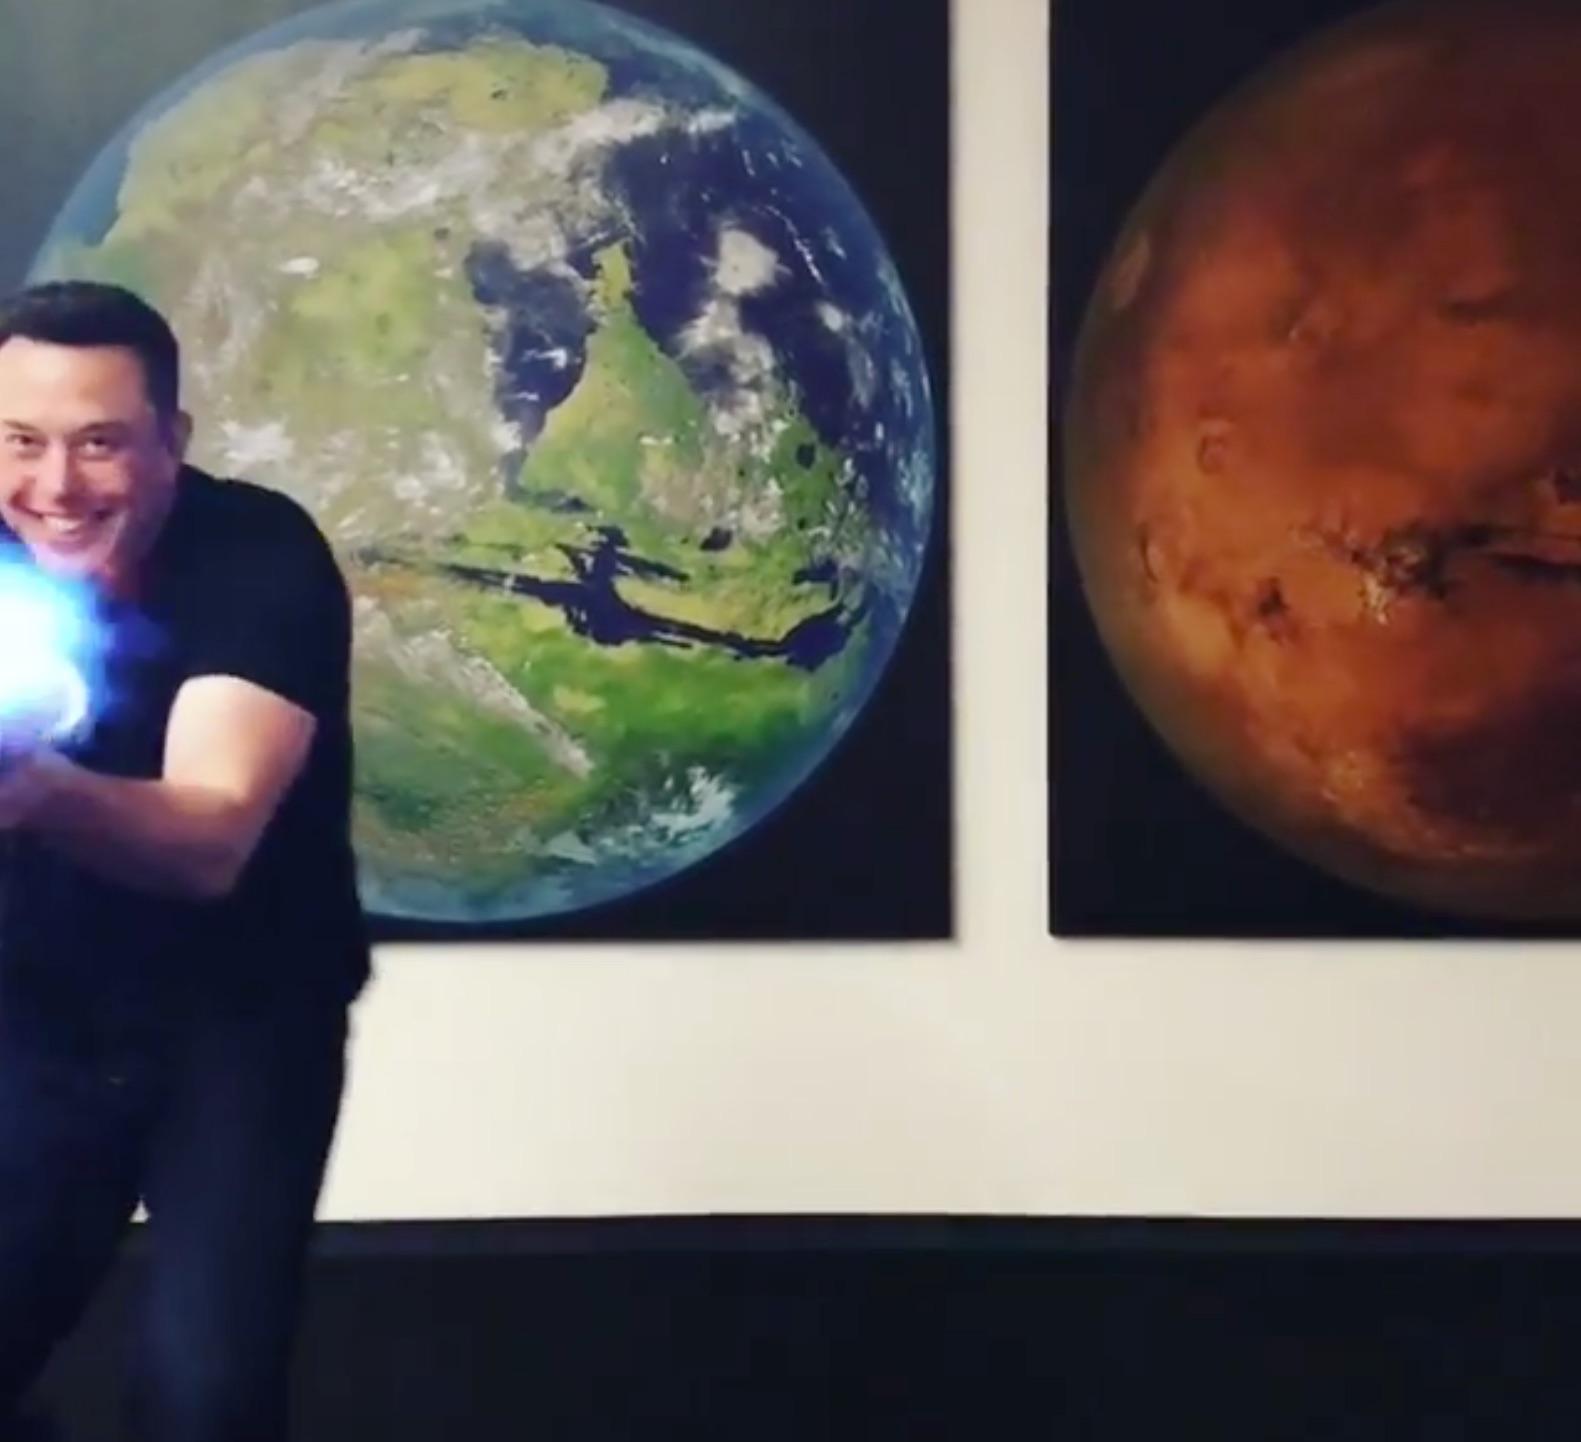 Elon-Musk-The-Boring_Company_Flamethrower-demo